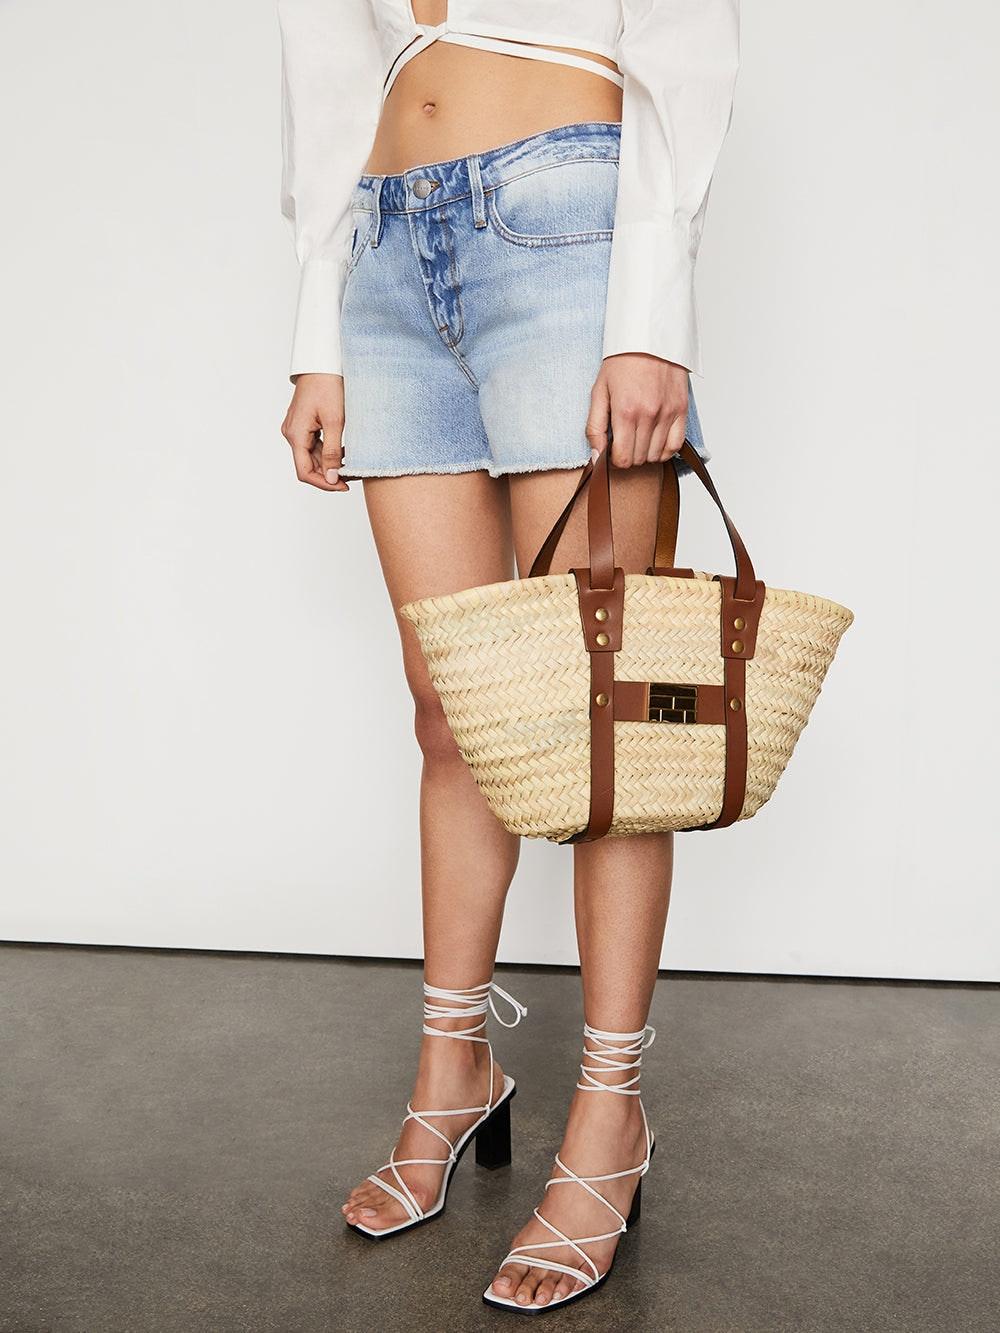 handbag front view 2